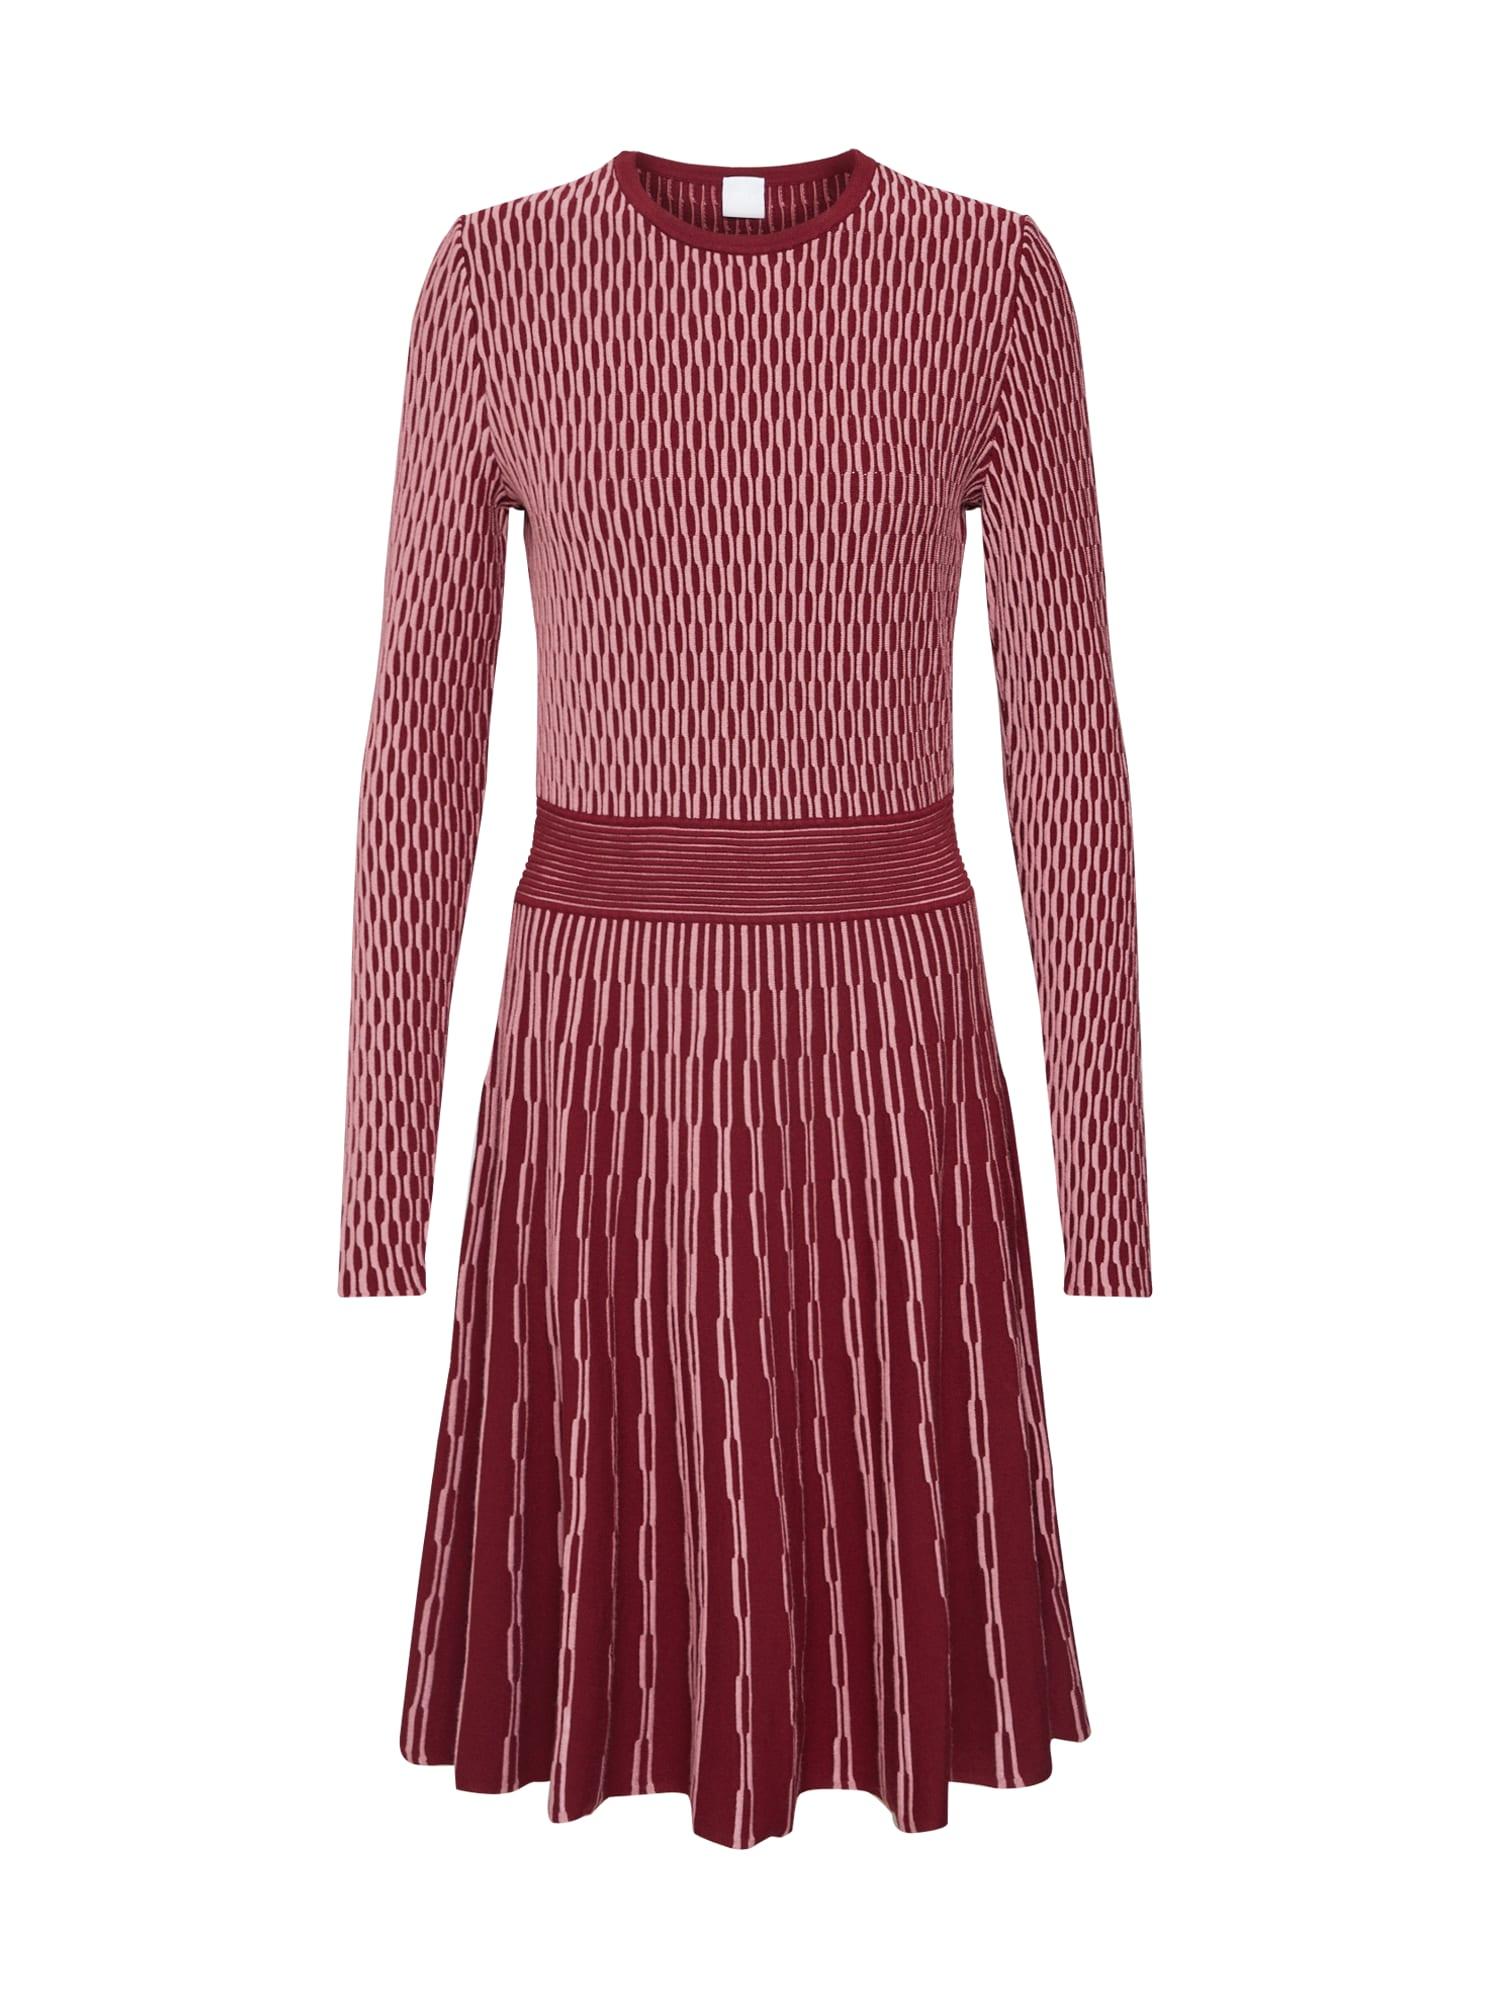 BOSS Megzta suknelė 'Illoran' raudona